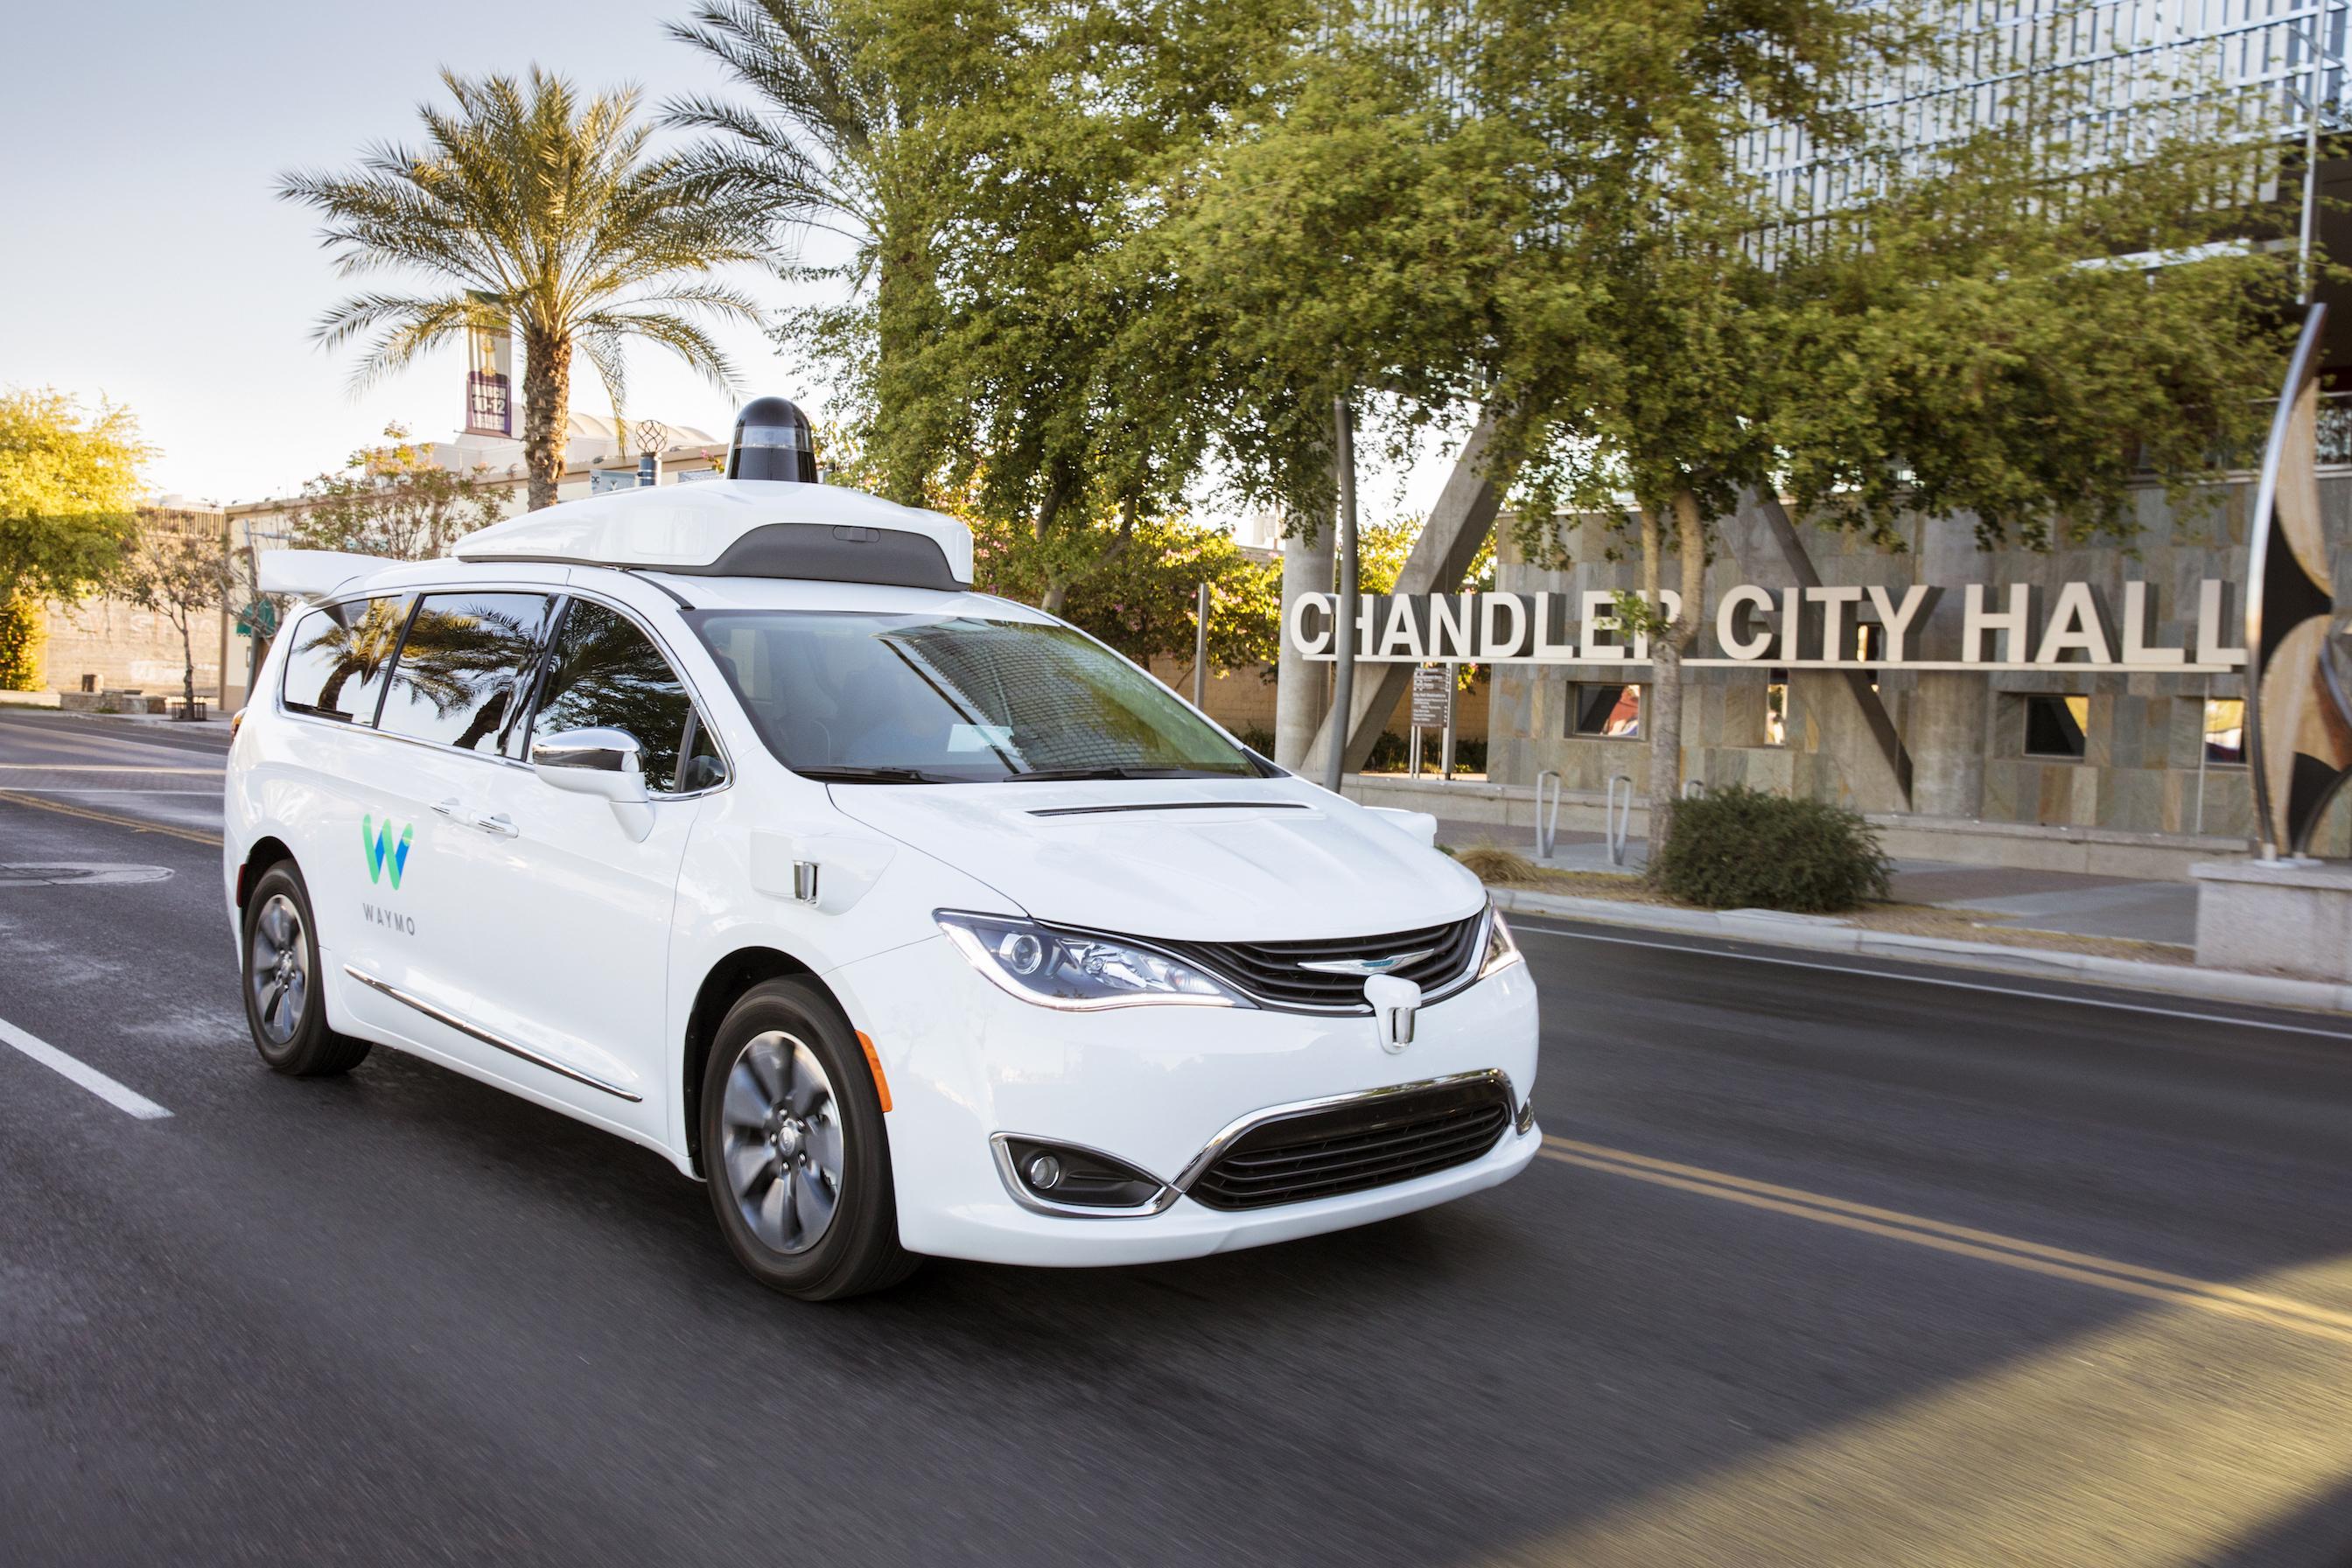 A white Chrysler Pacifica minivan with Waymo logos and visible self-driving sensor hardware.